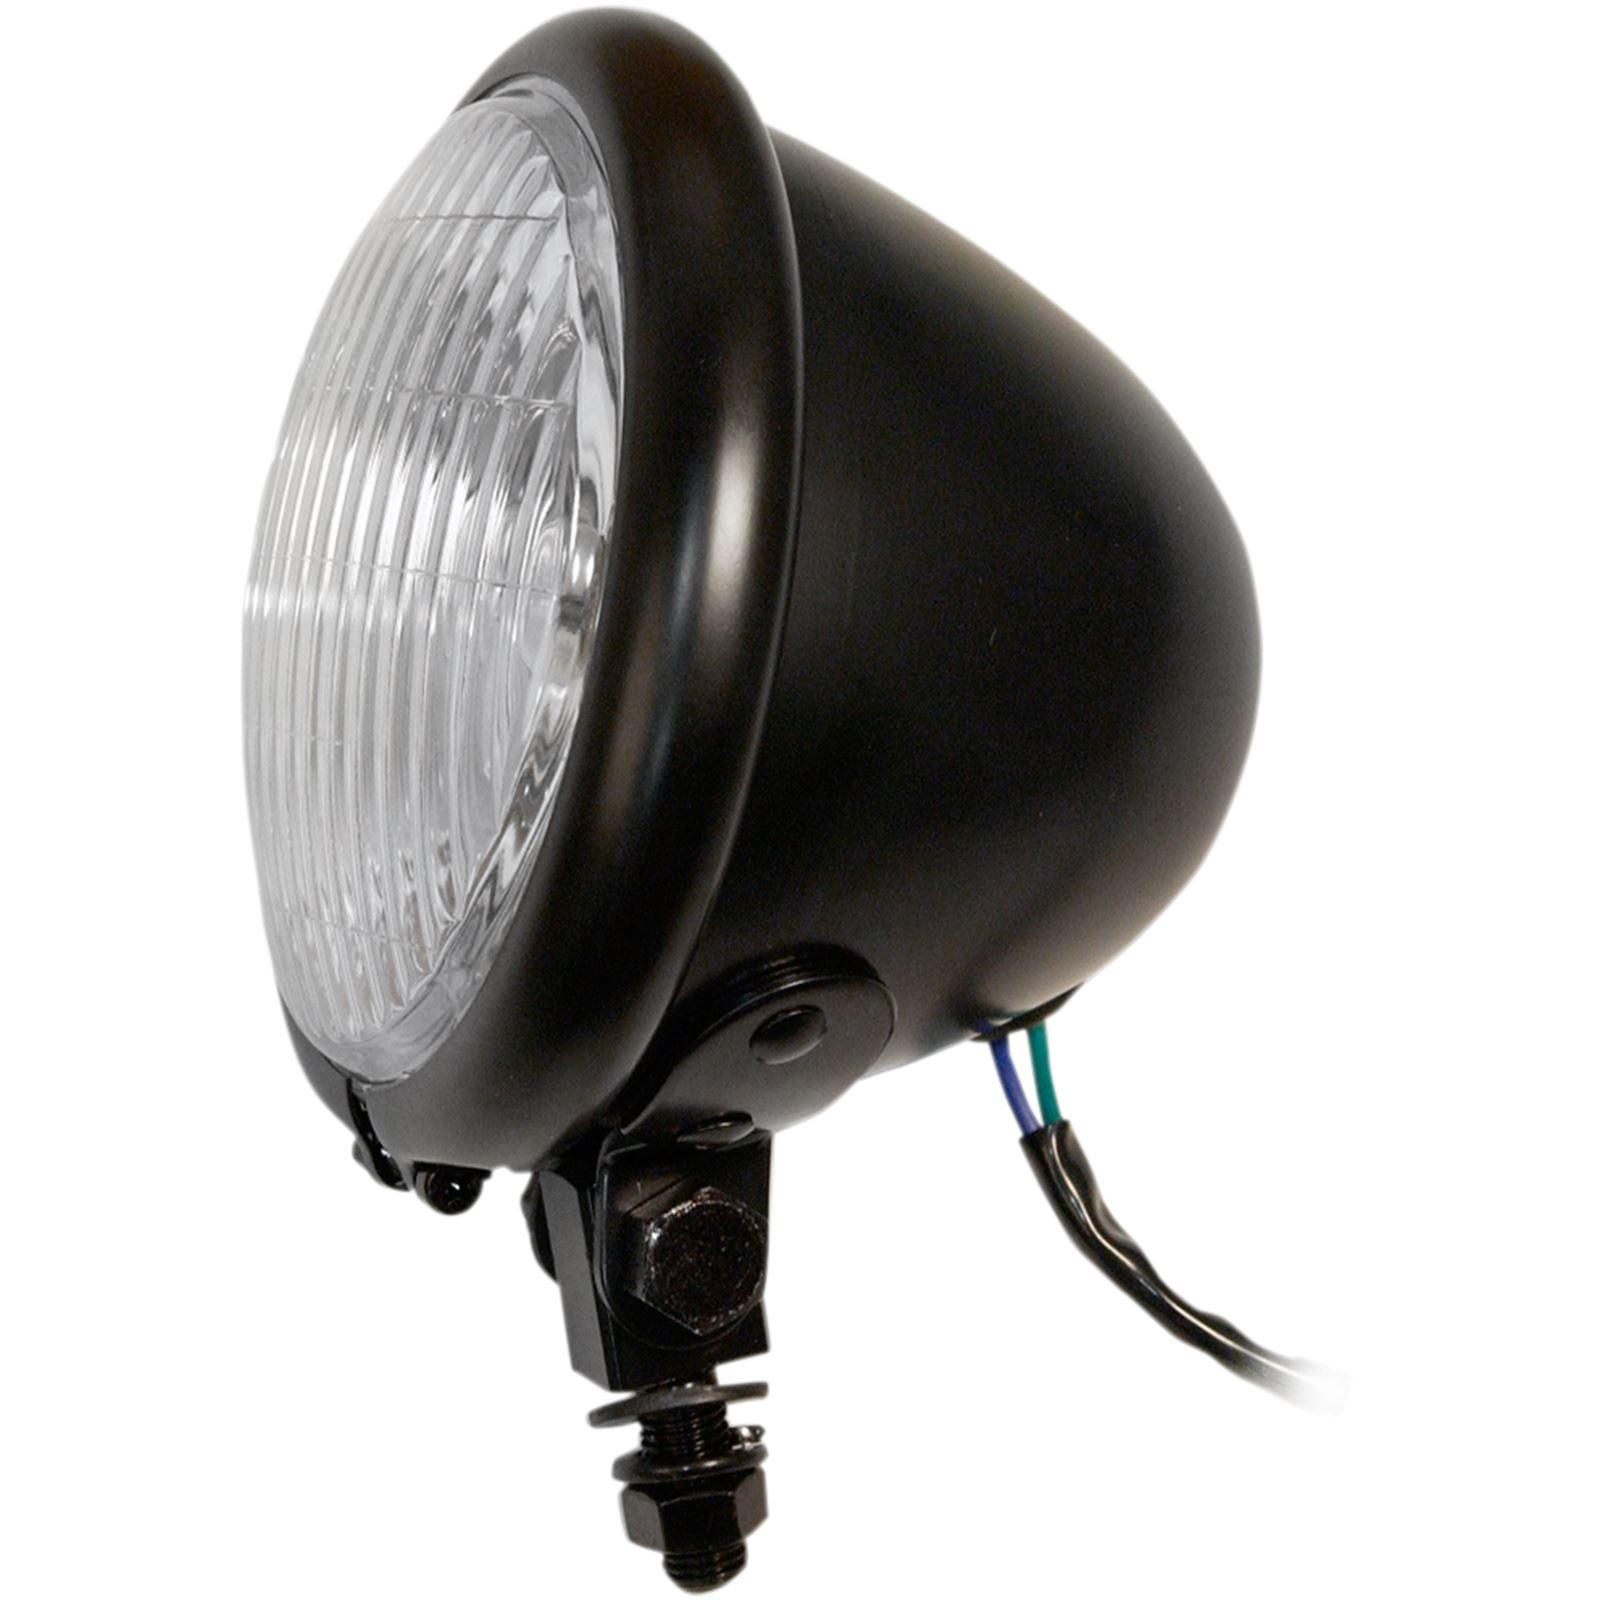 "Emgo 4 1/2"" Spotlamp - Black"